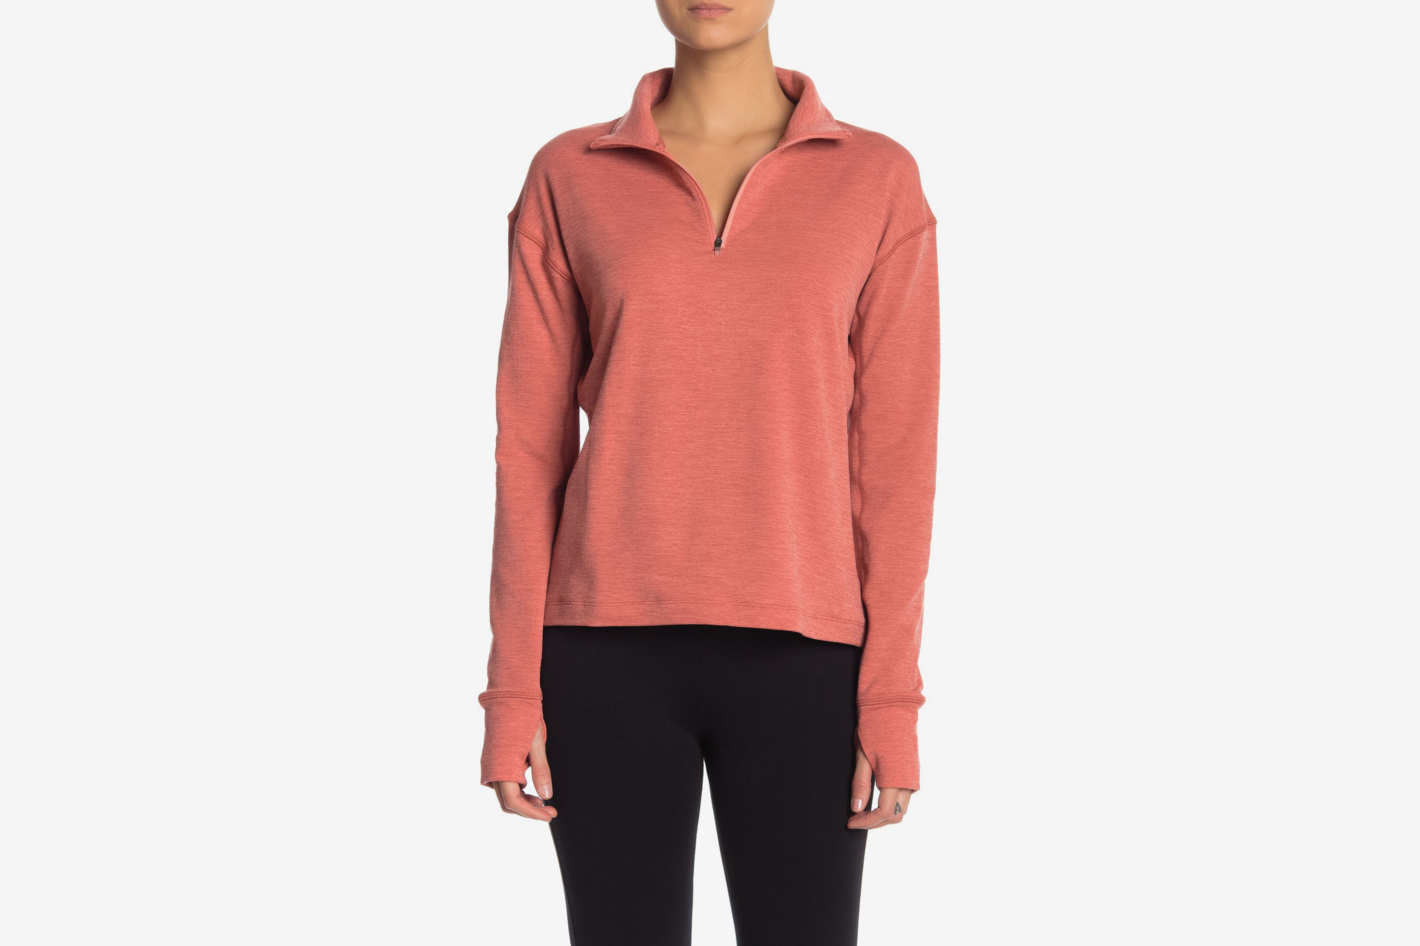 Outdoor Voices OV Fleece Half Zip Pullover